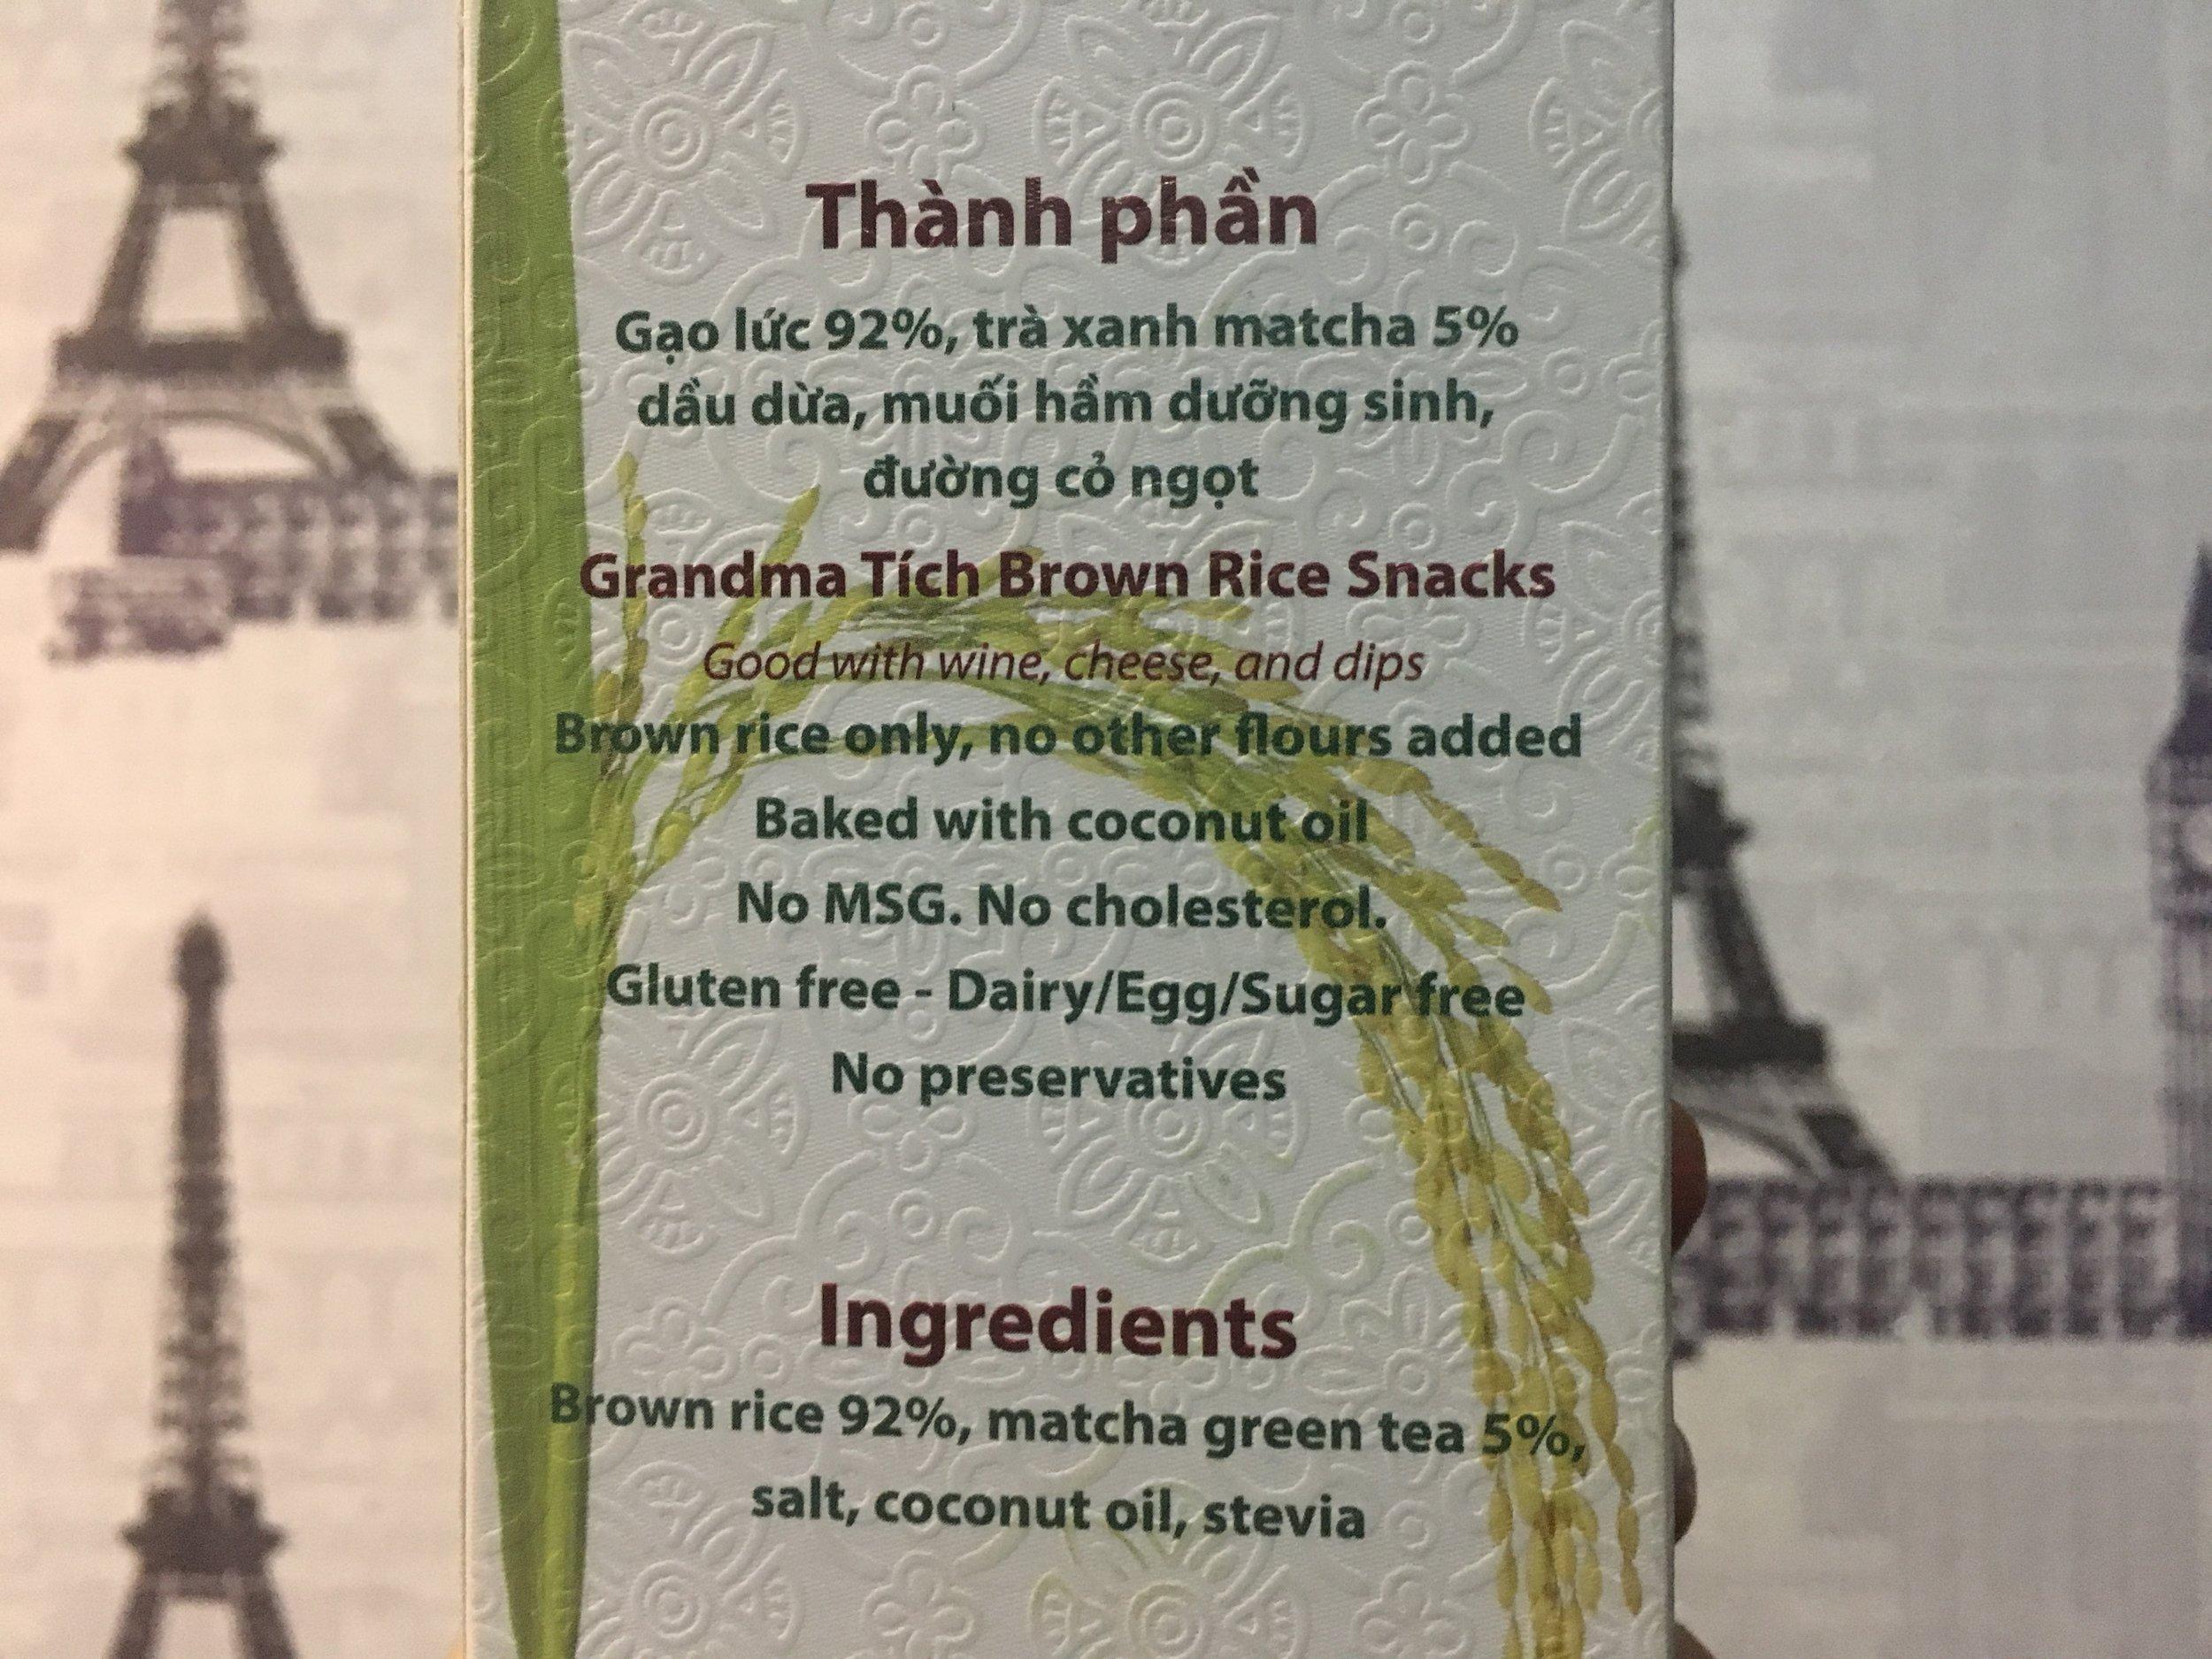 5 ingredients, no added sugar, no cholesterol, no saturated fat, and no trans fat